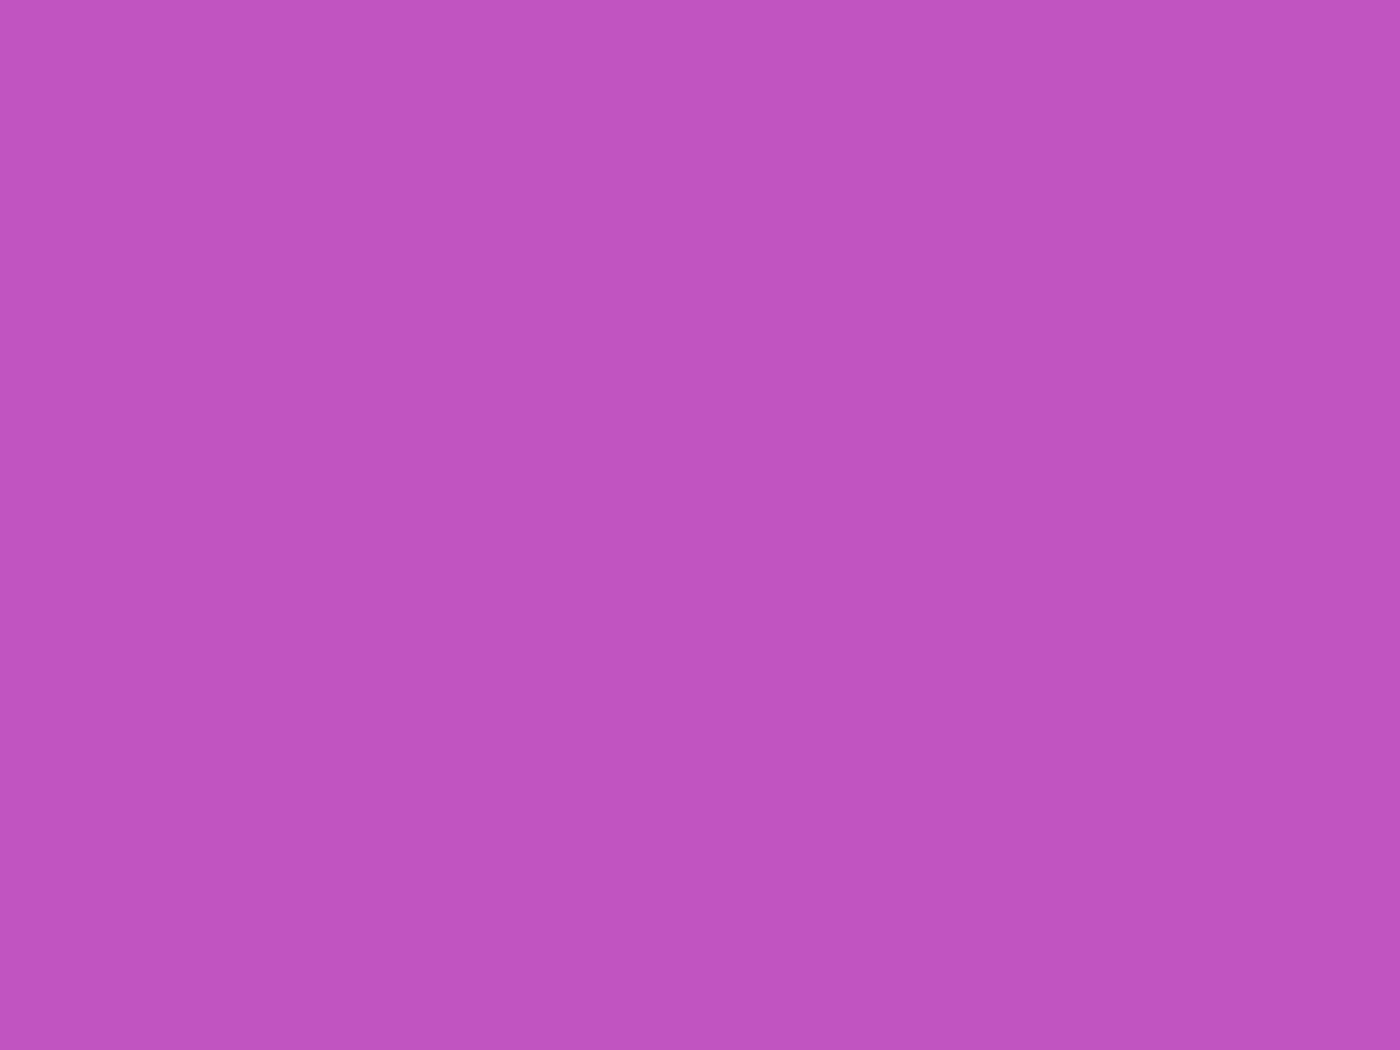 1400x1050 Fuchsia Crayola Solid Color Background